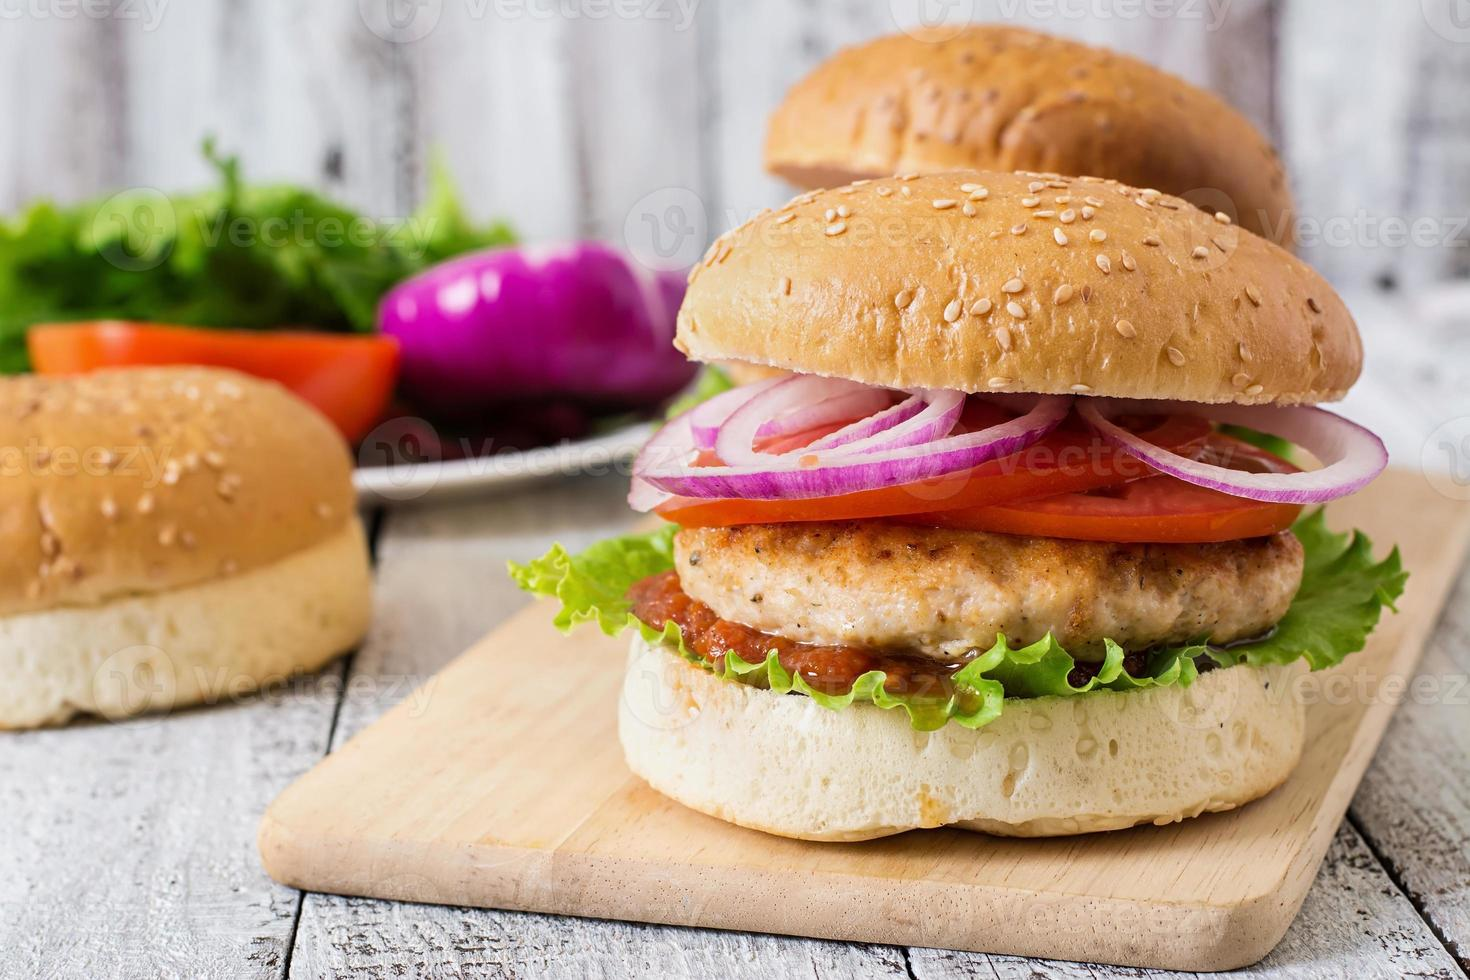 sanduíche com hambúrguer de frango, tomate, cebola roxa e alface foto